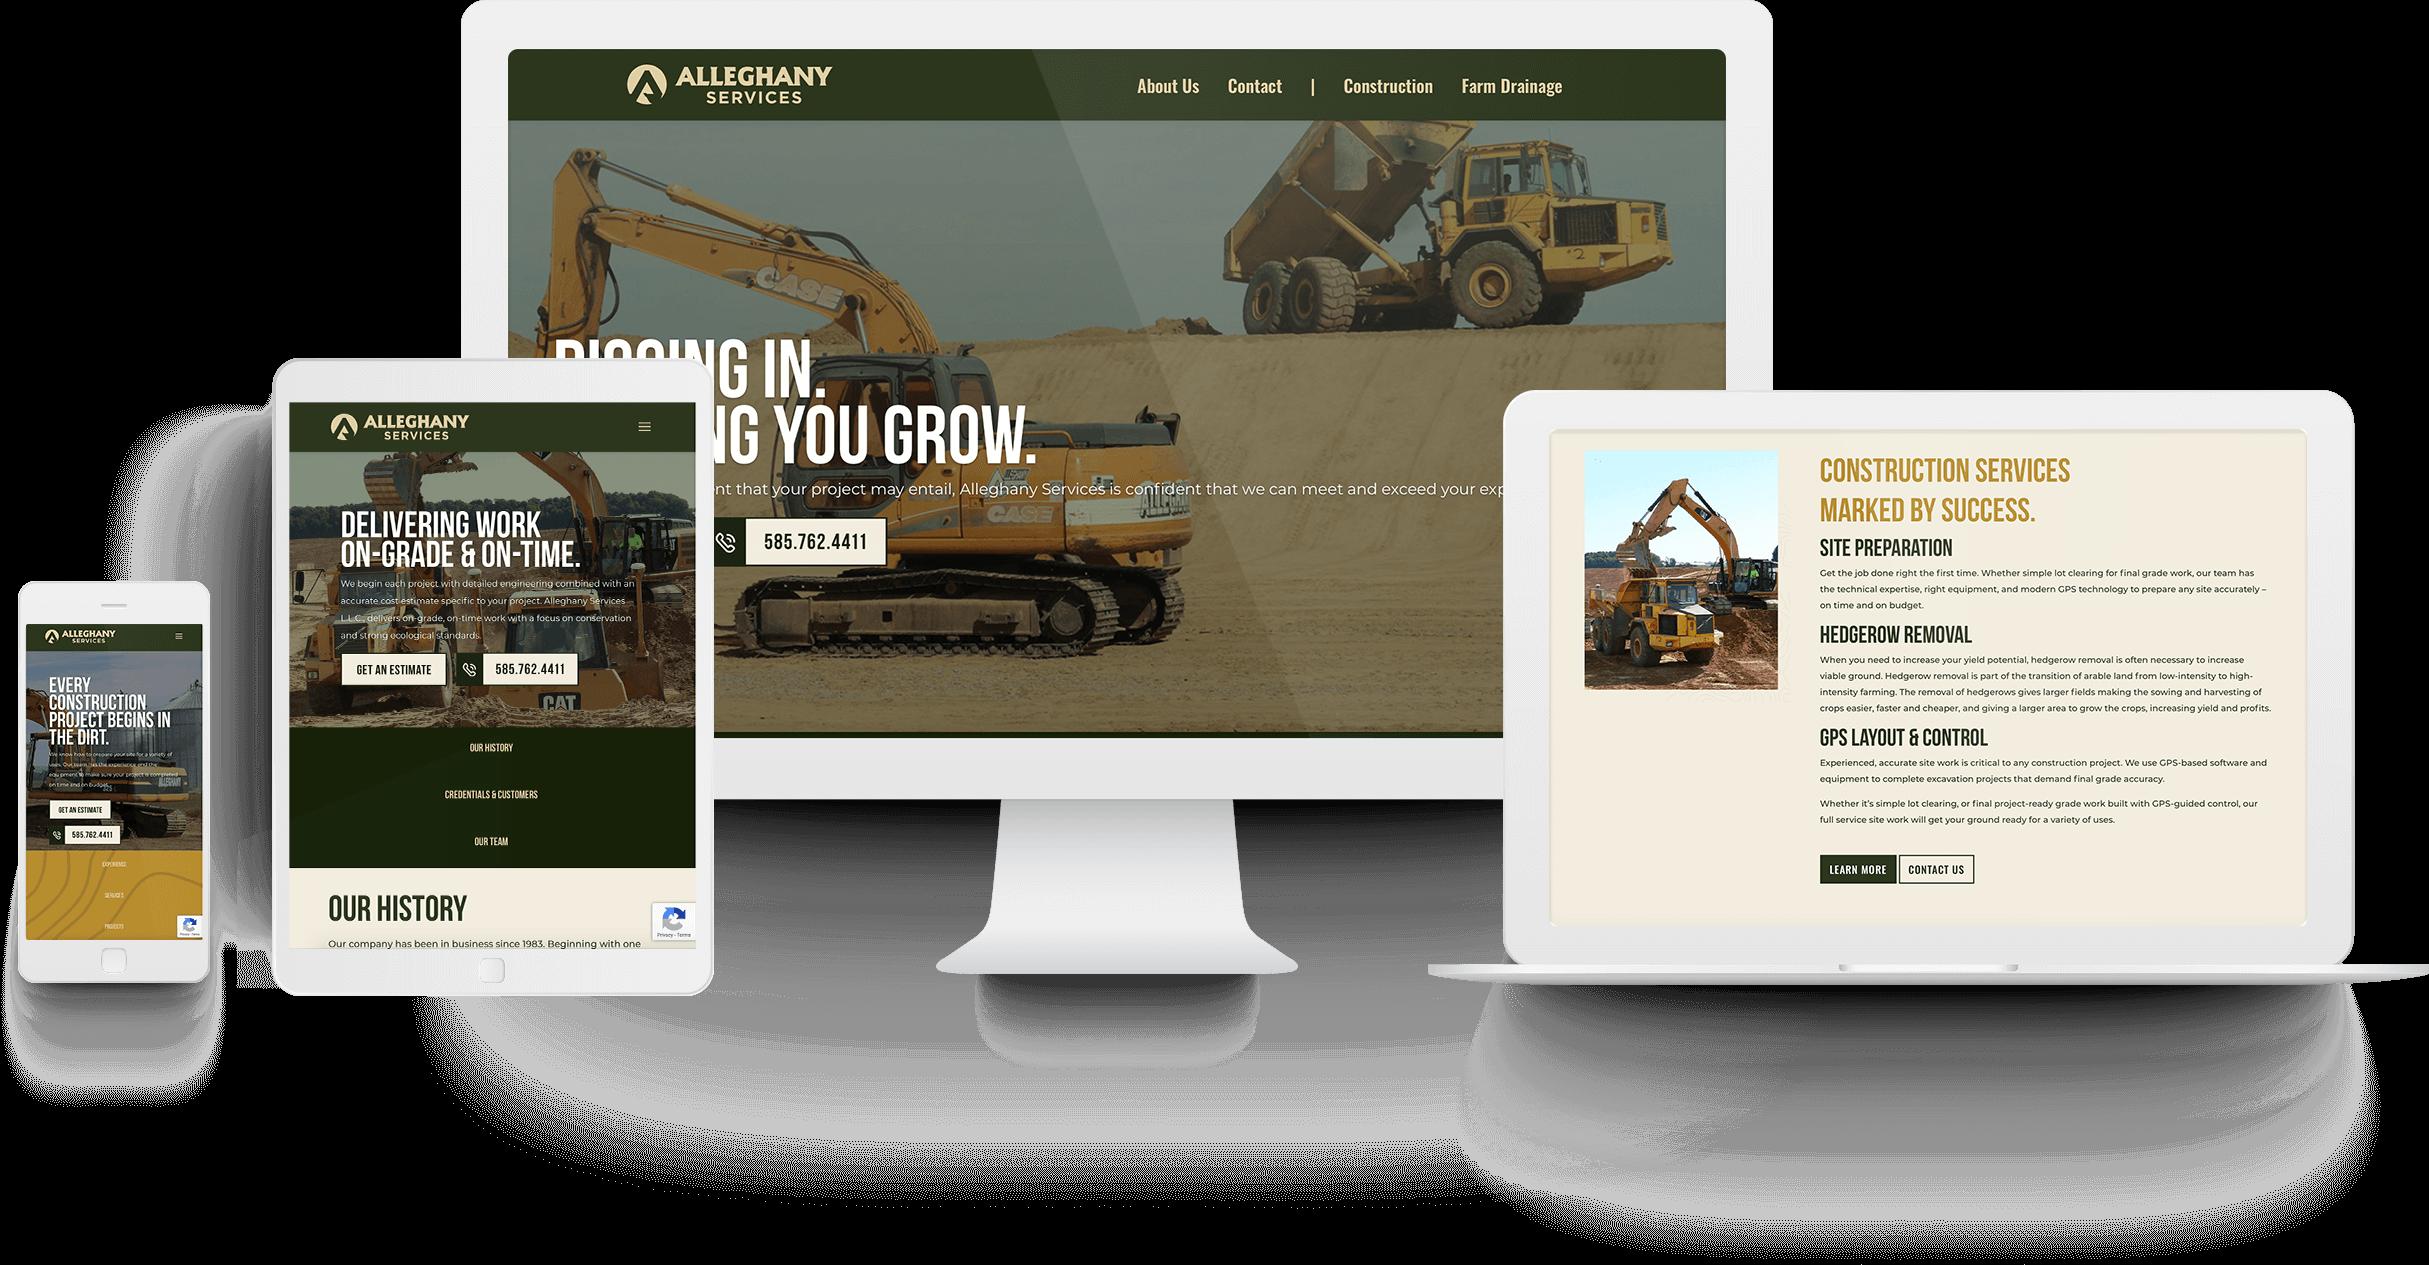 Alleghany Farm Services Website Design